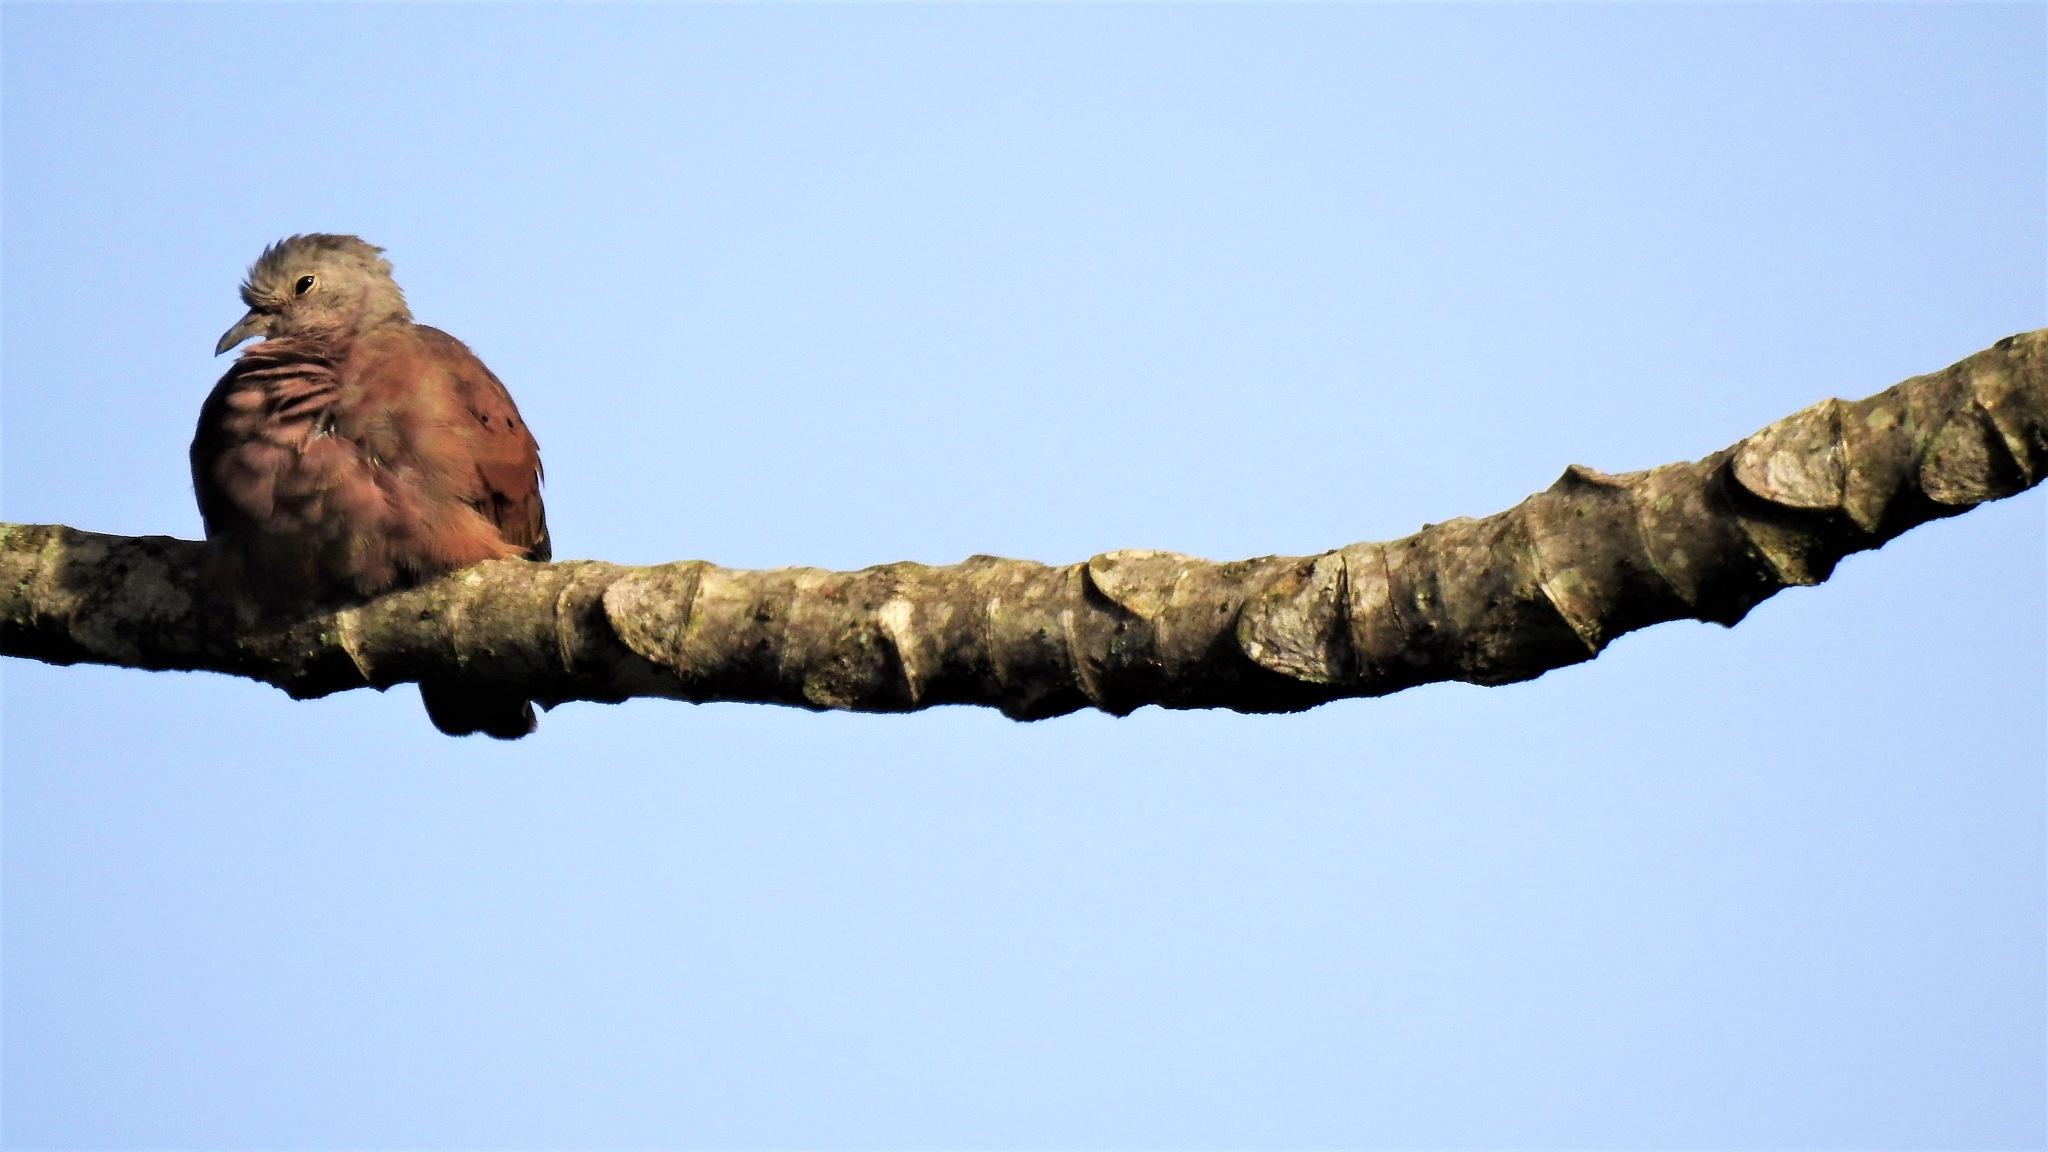 Small kind of wild pigeon by Enéias Carvalho